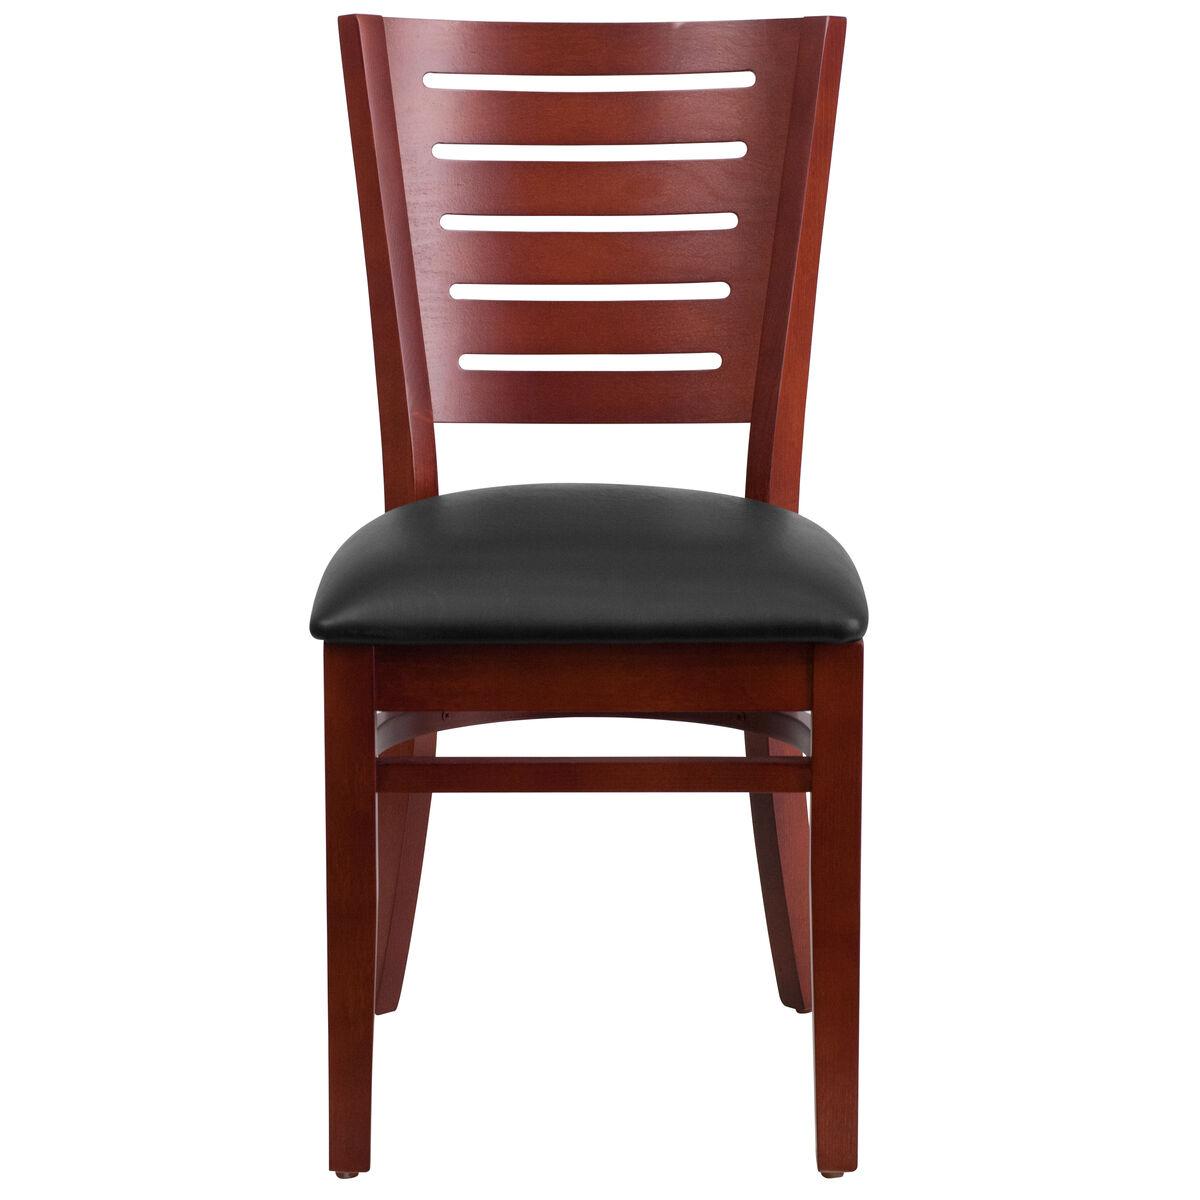 Wood slat back chair bfdh dg w